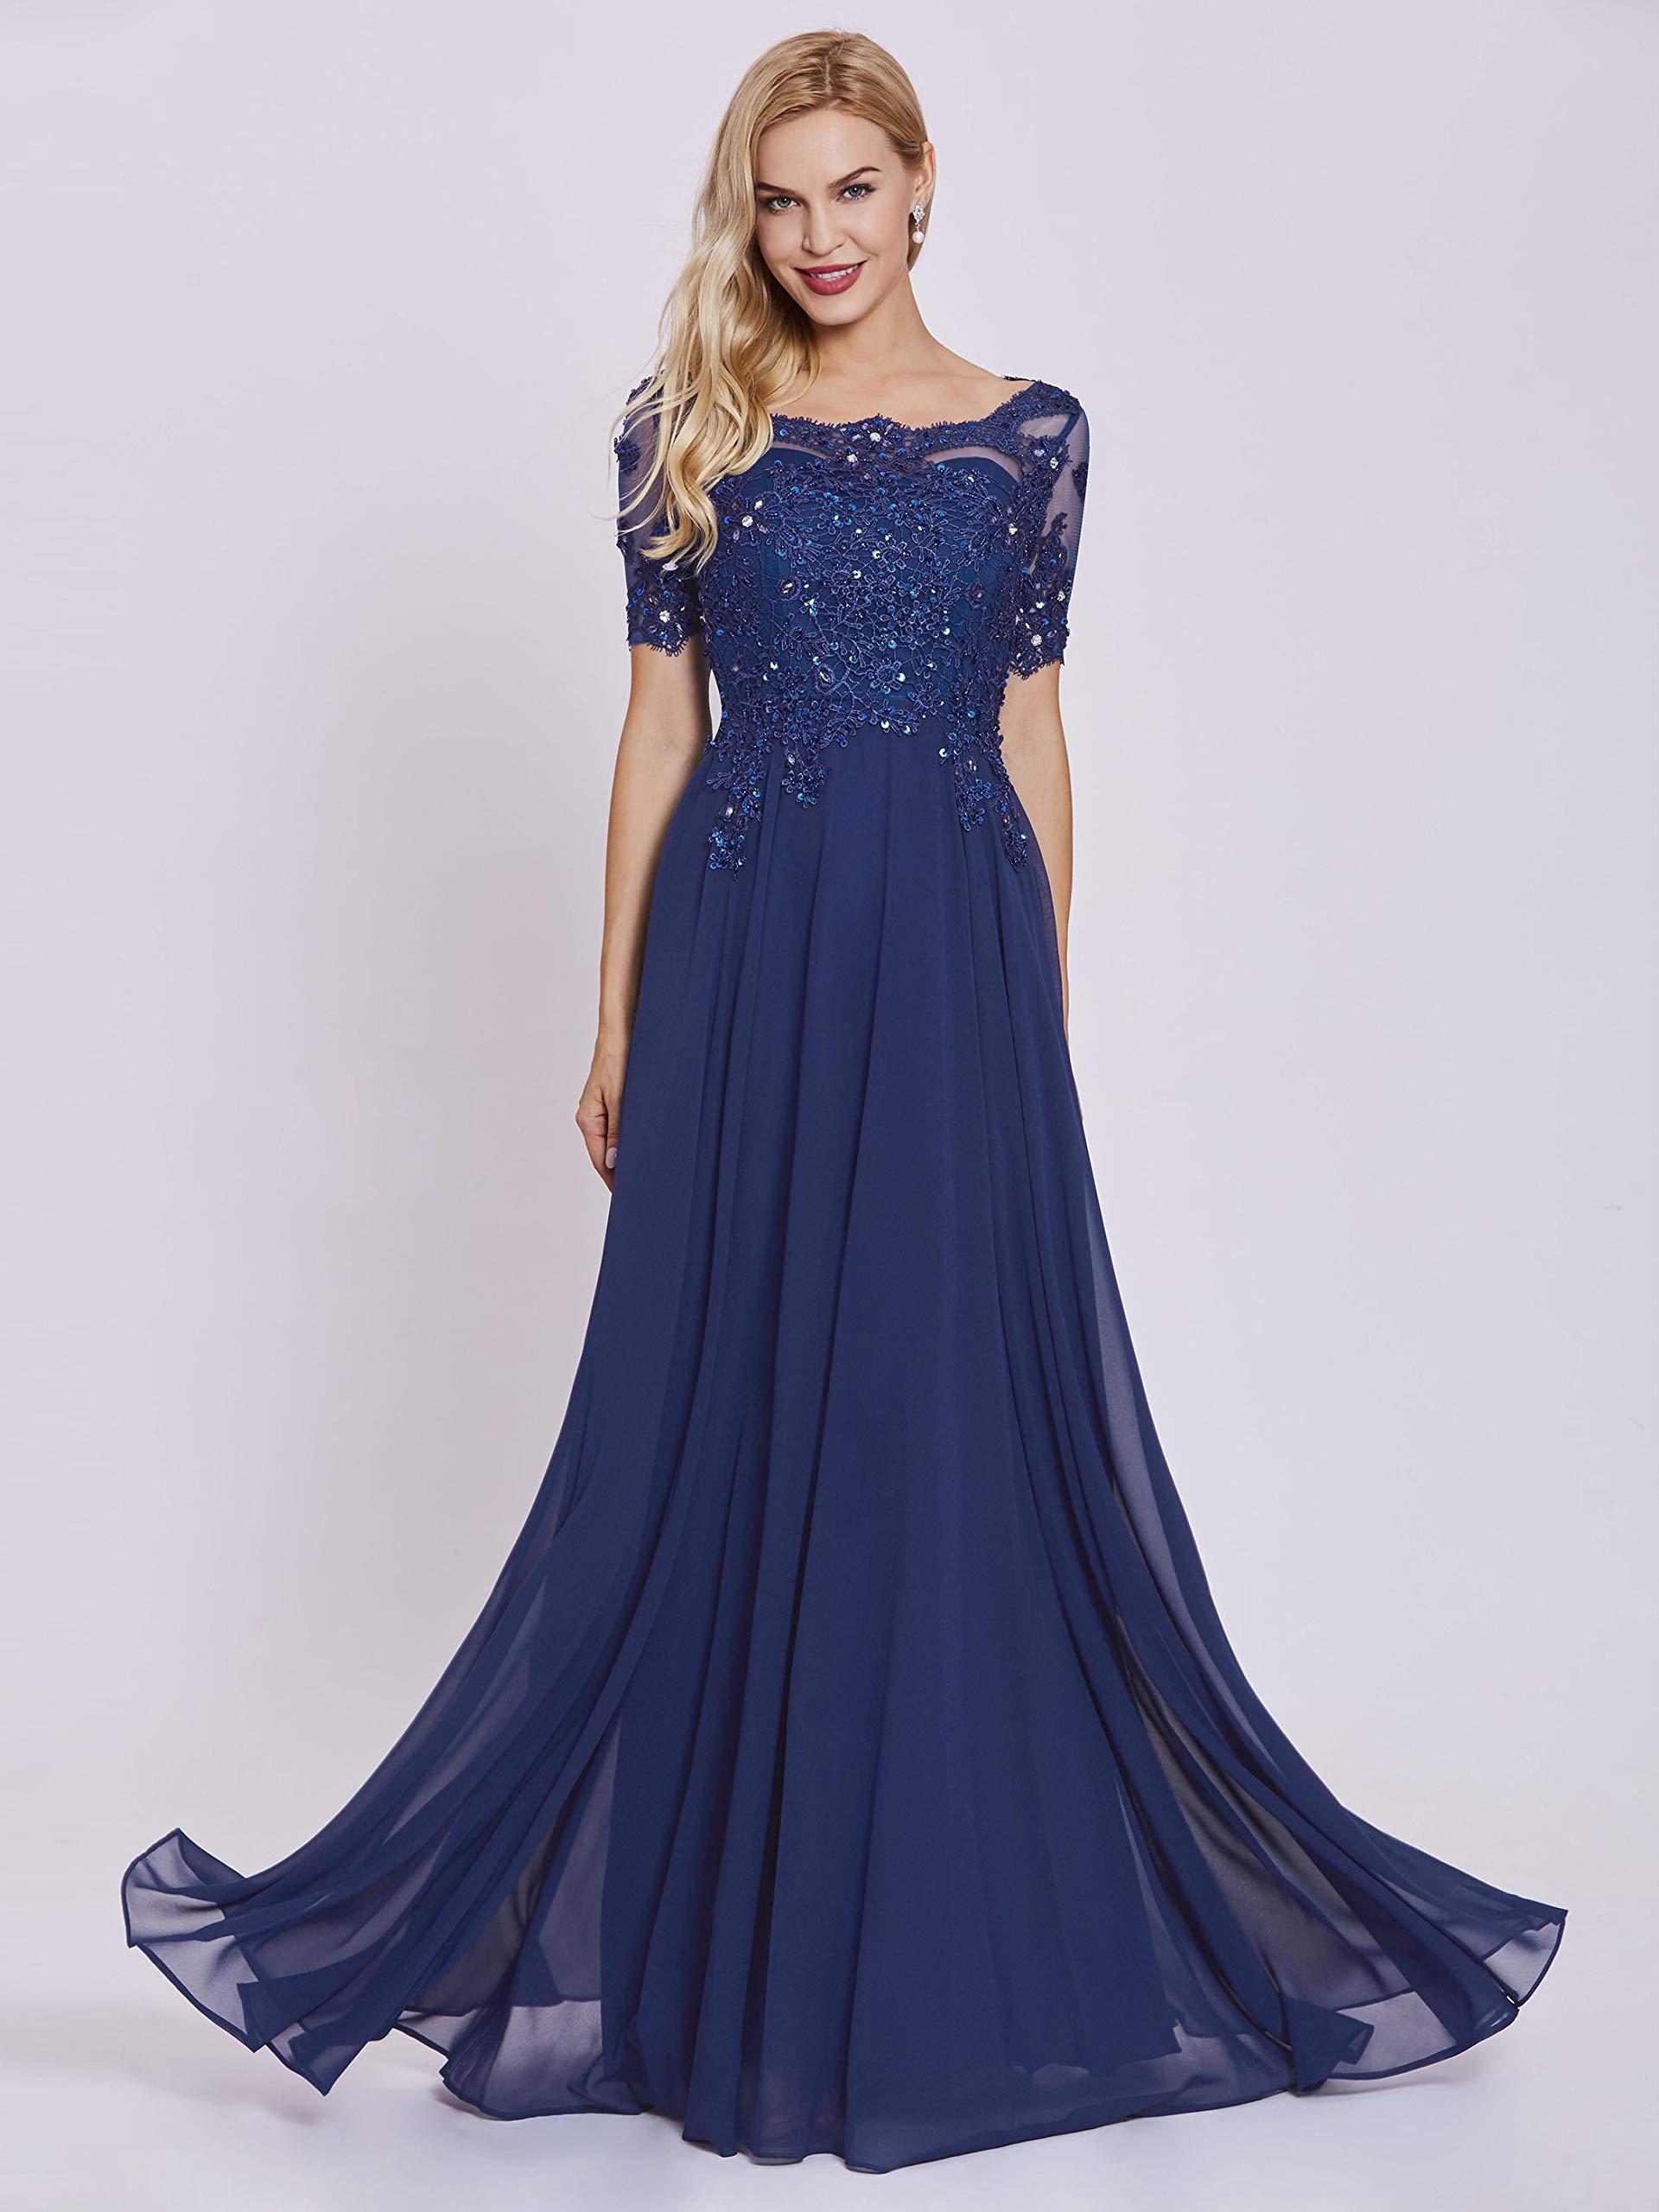 2016 Elegant Long Sleeve Mother Of The Bride Dresses Plus